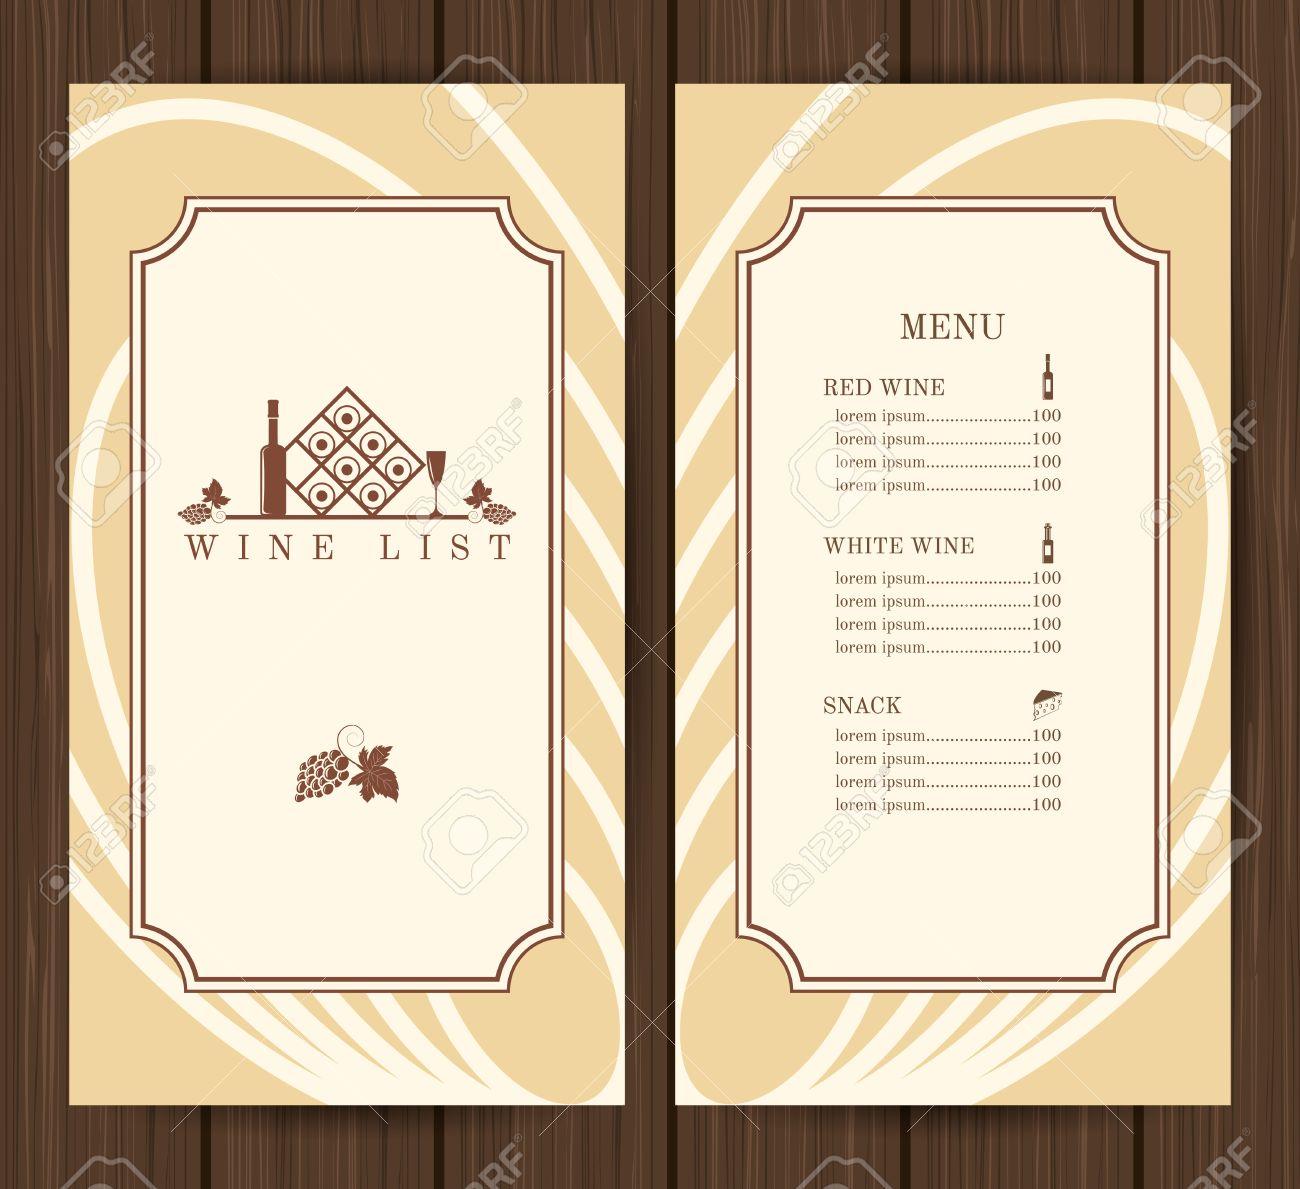 Wine List Restaurant Menu Template On Wooden Background Vector – Free Wine List Template